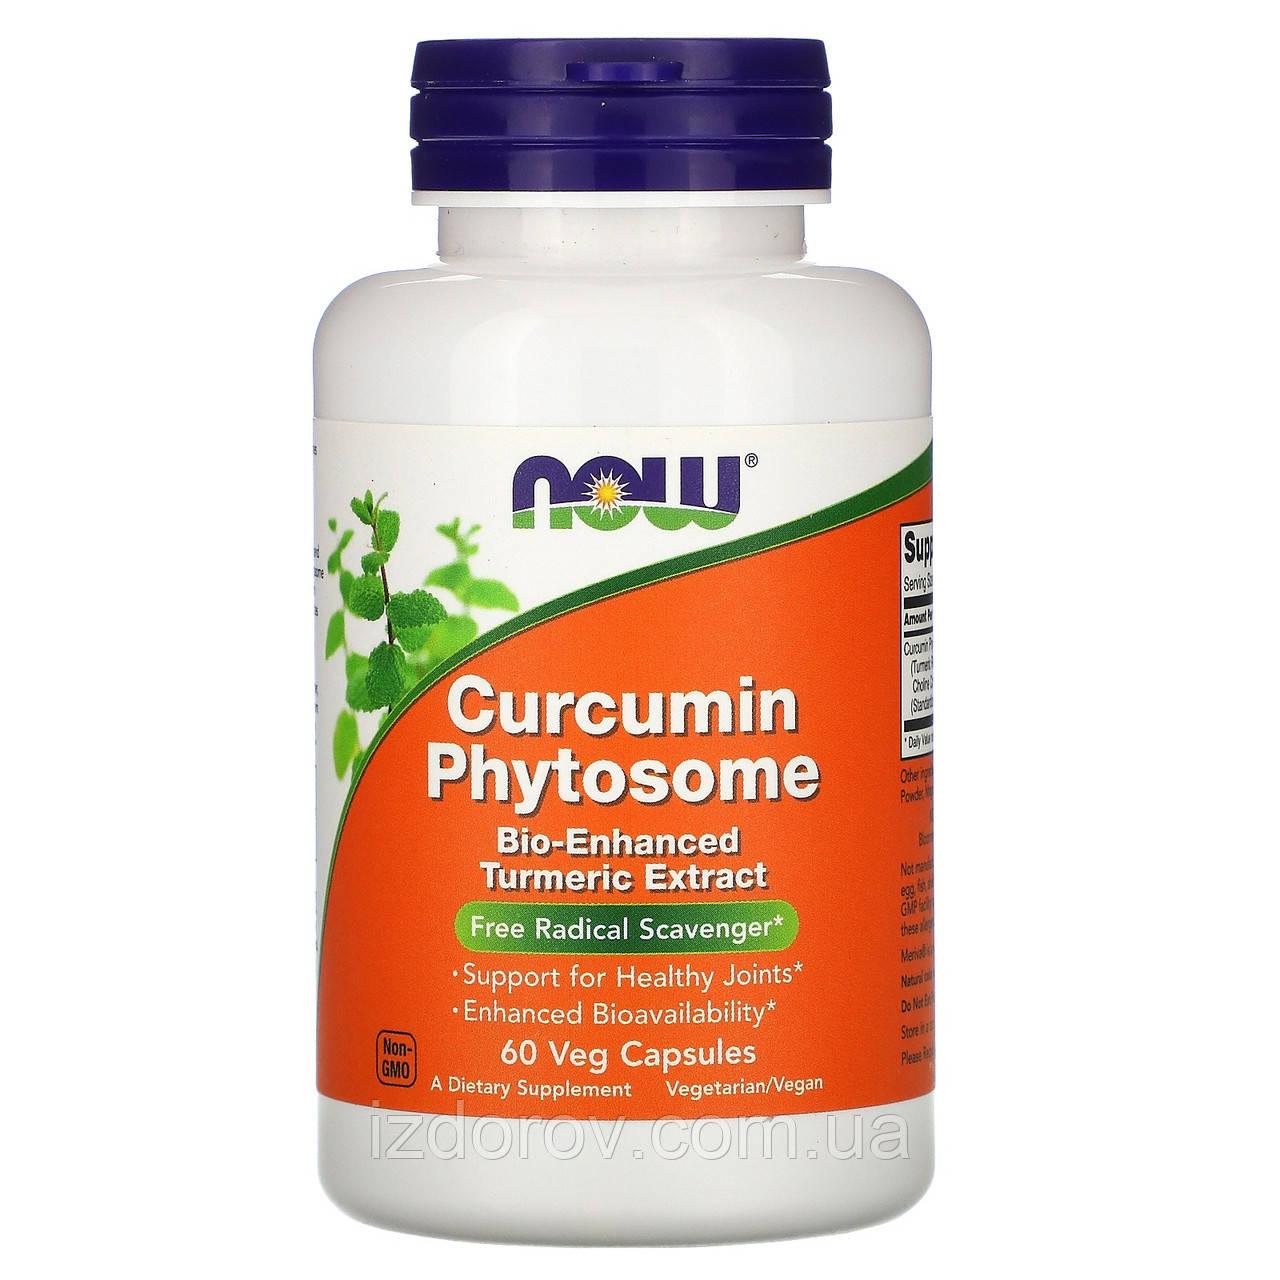 Now Foods, Фитосома куркумину 500 мг, Meriva Turmeric Phytosome, екстракт, антиоксидант, 60 капсул